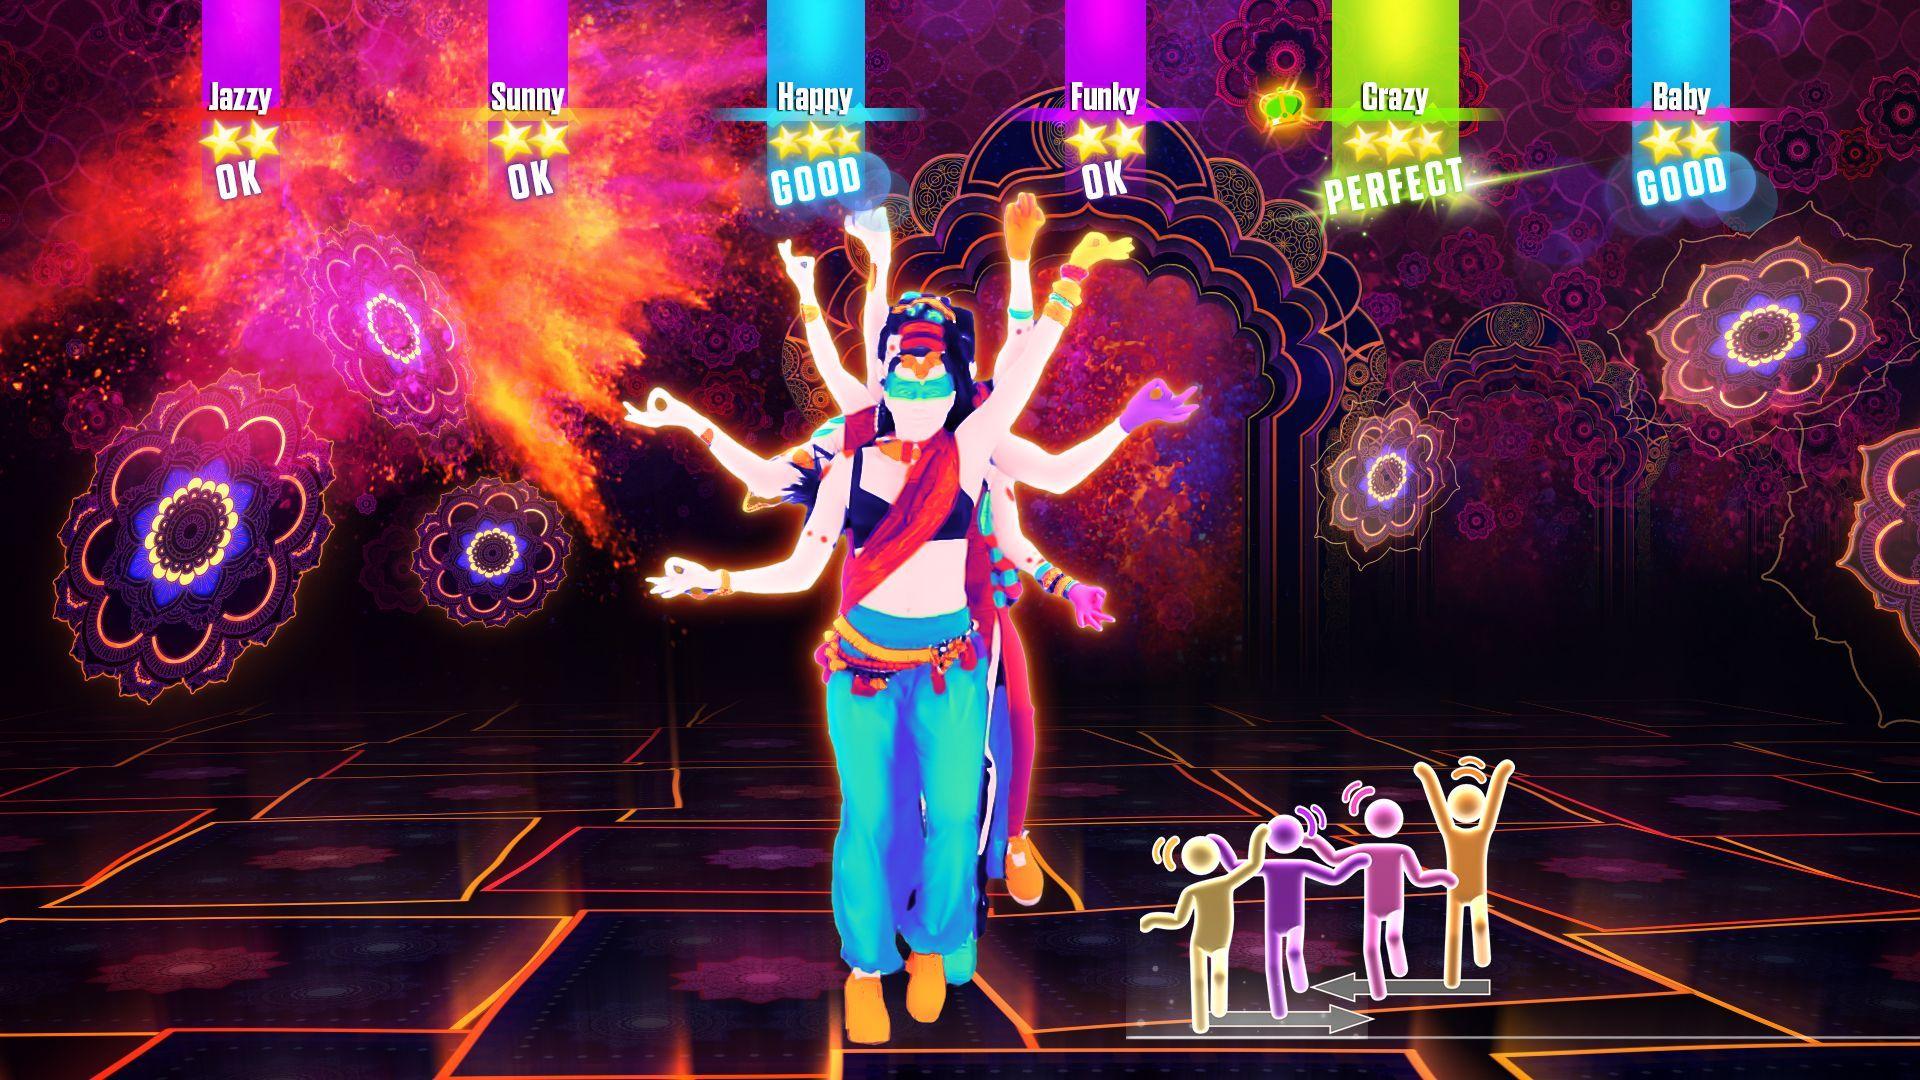 Just Dance 2017 (Nintendo Switch) - 5